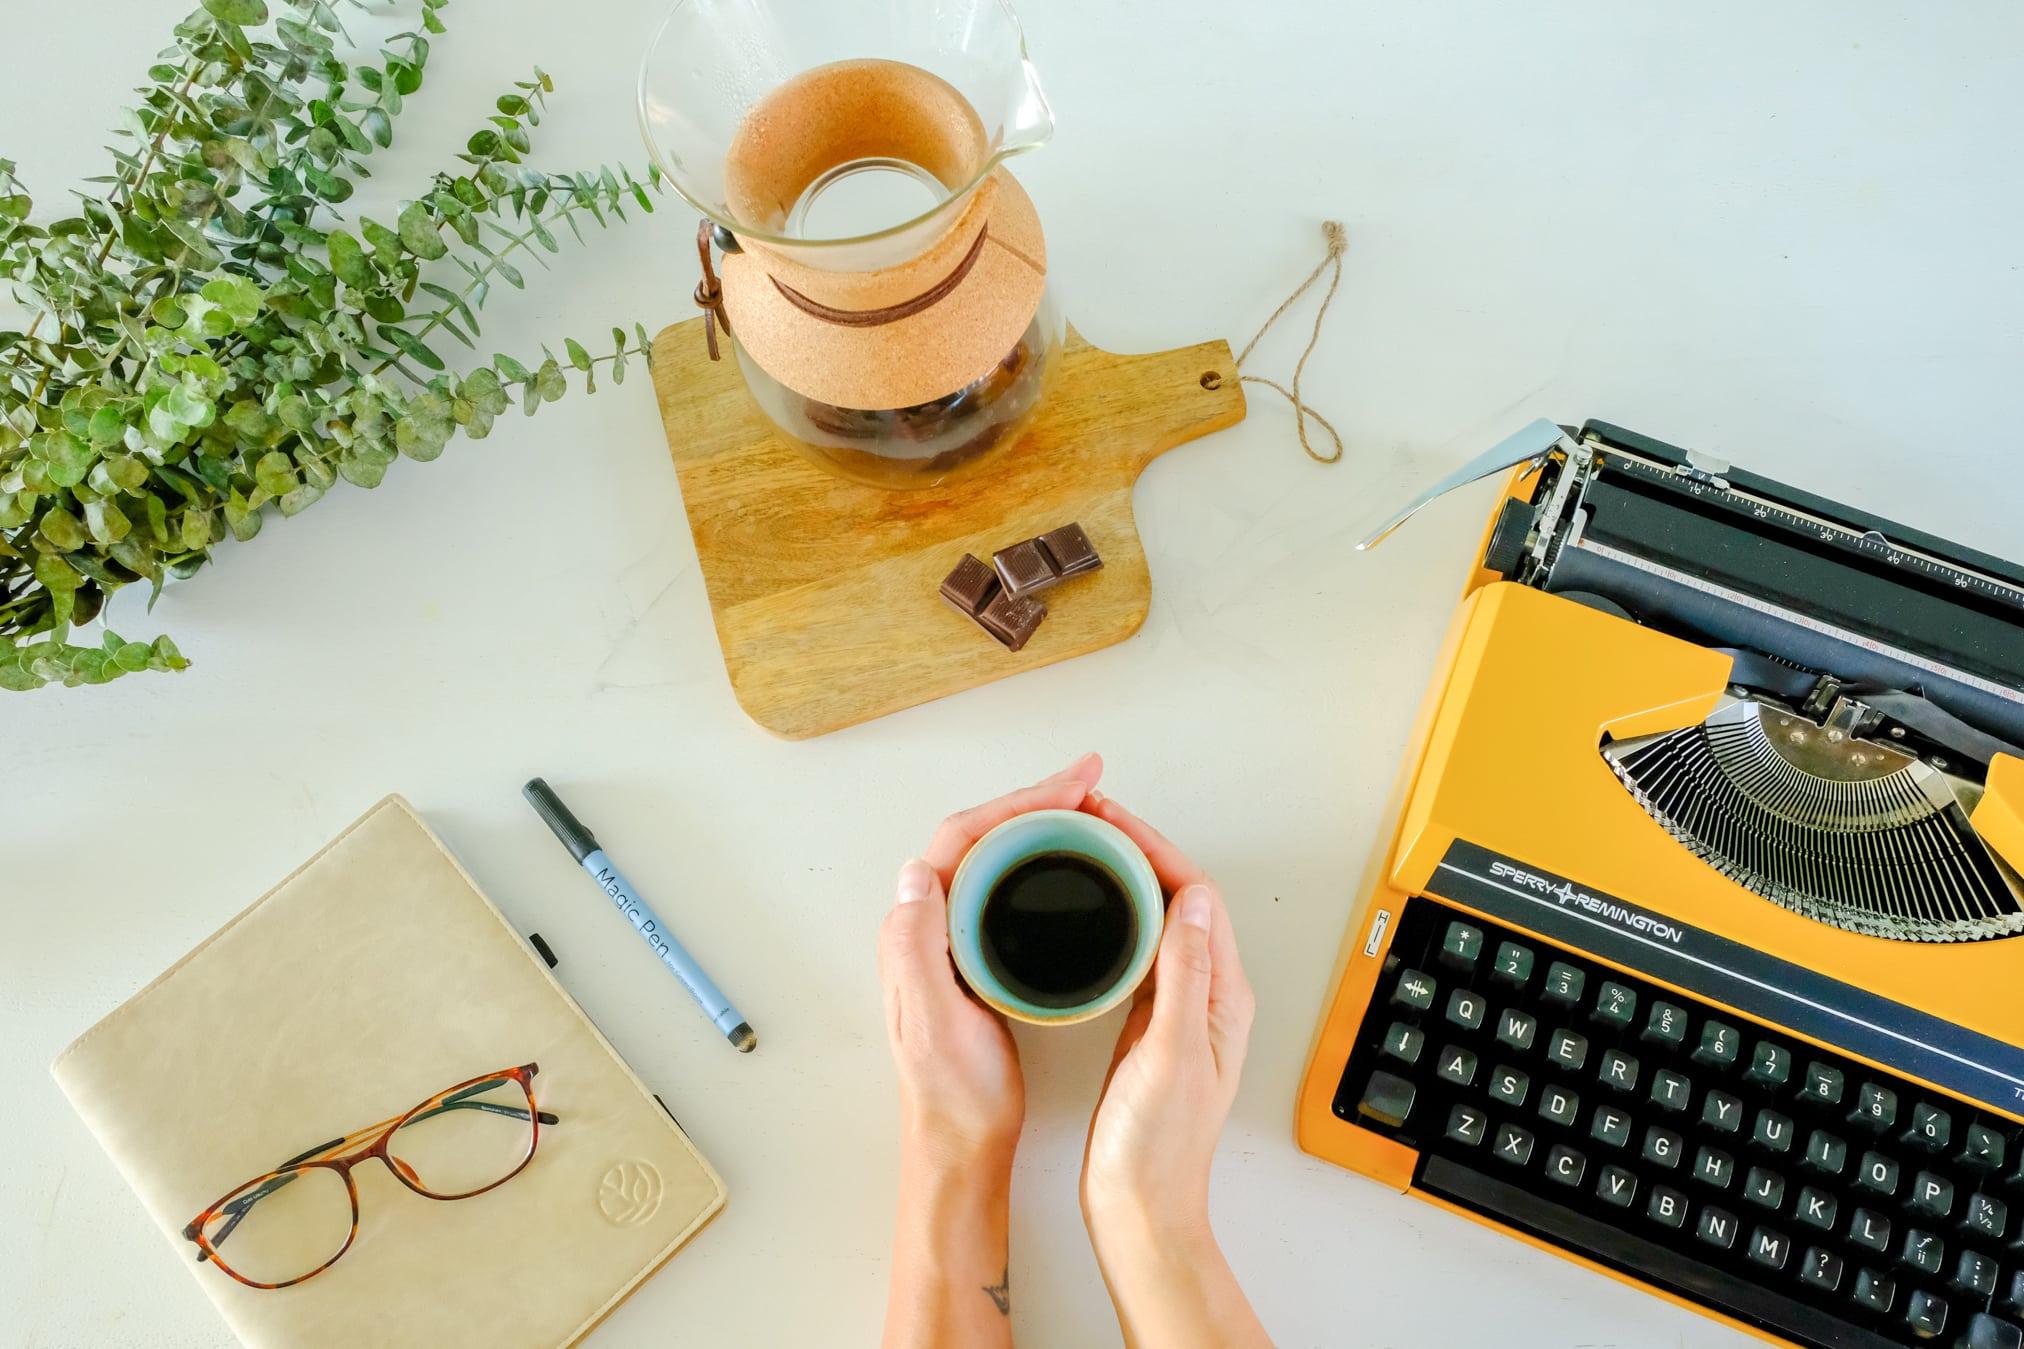 mirjam hart duurzame blogger